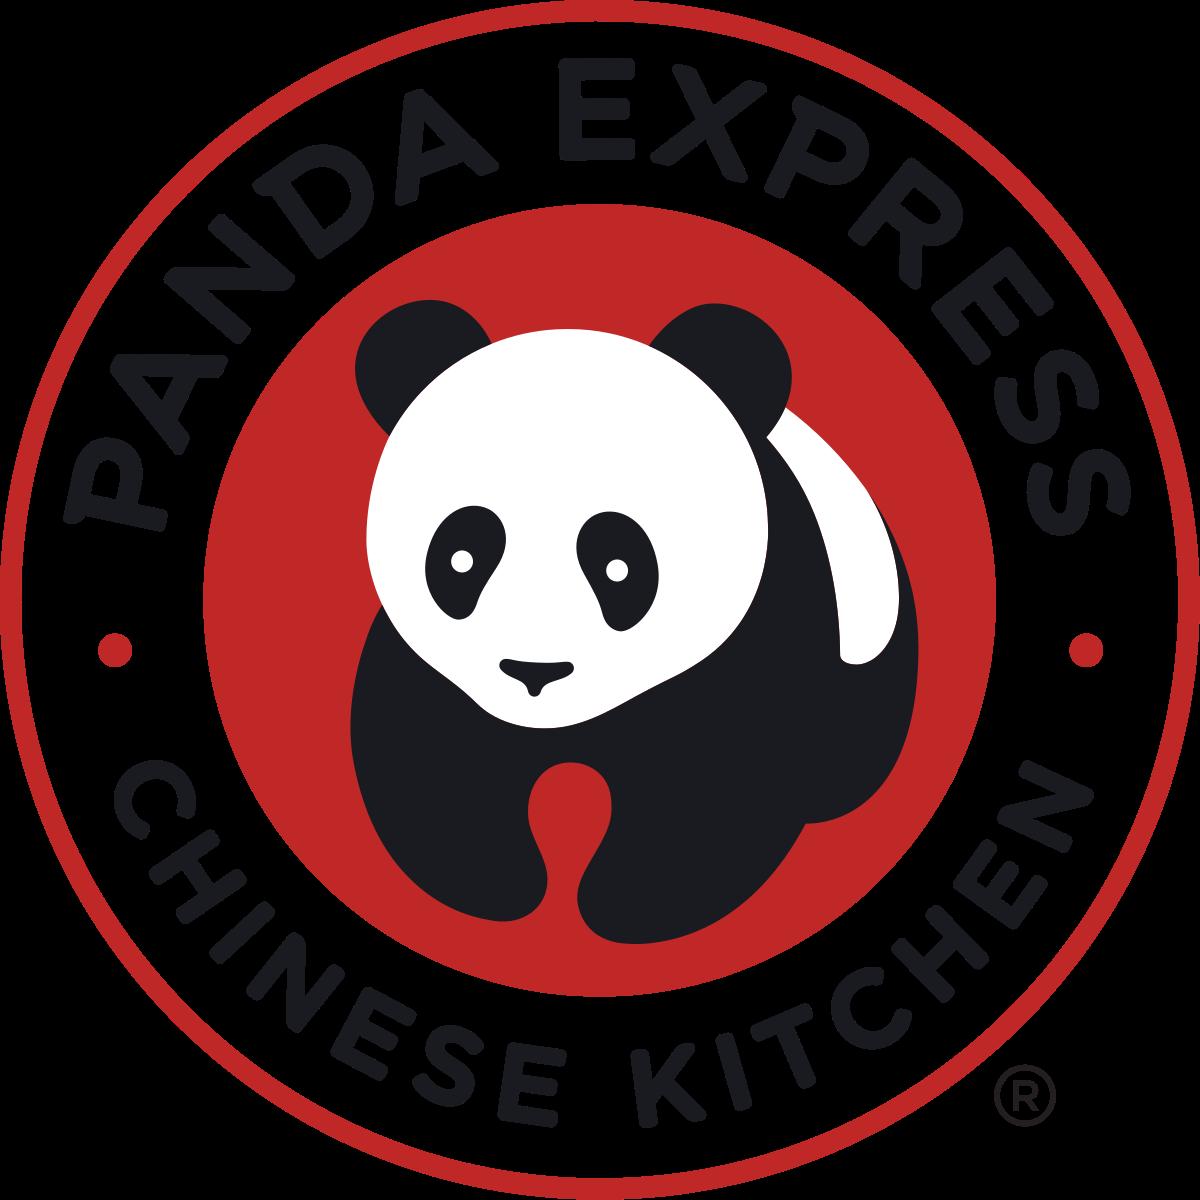 Panda Express #953